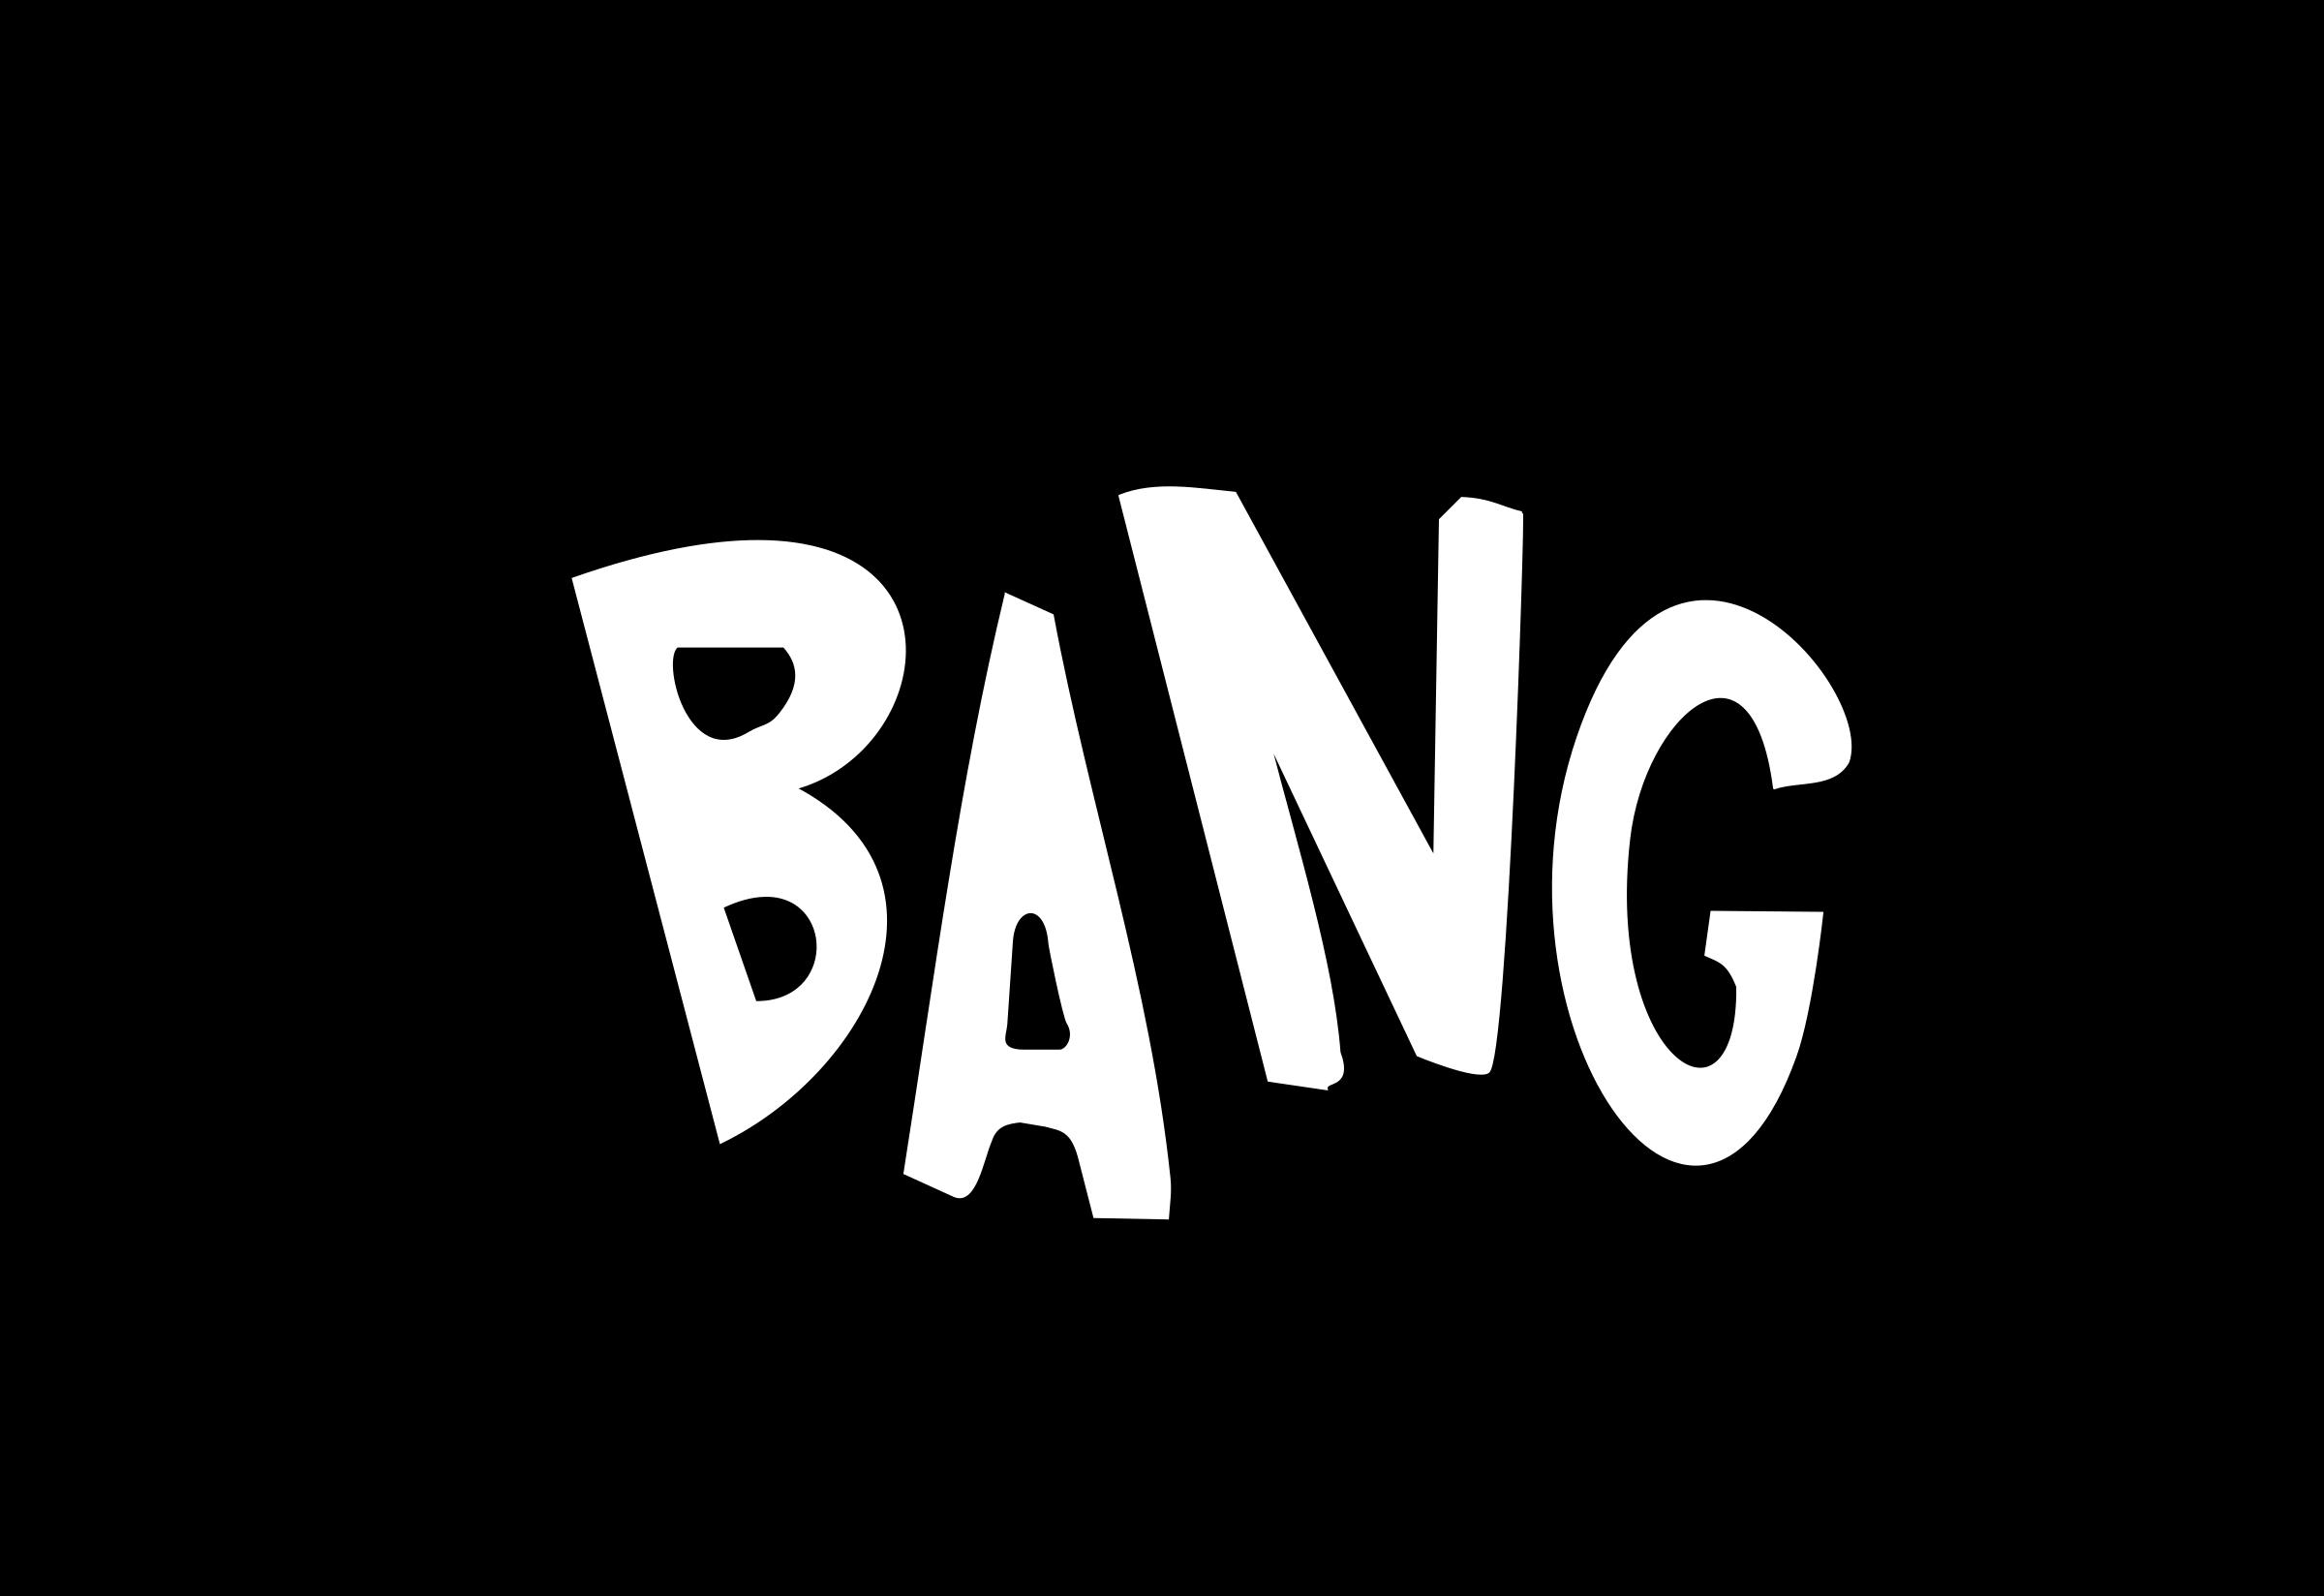 Words clipart pop. Bang big image png